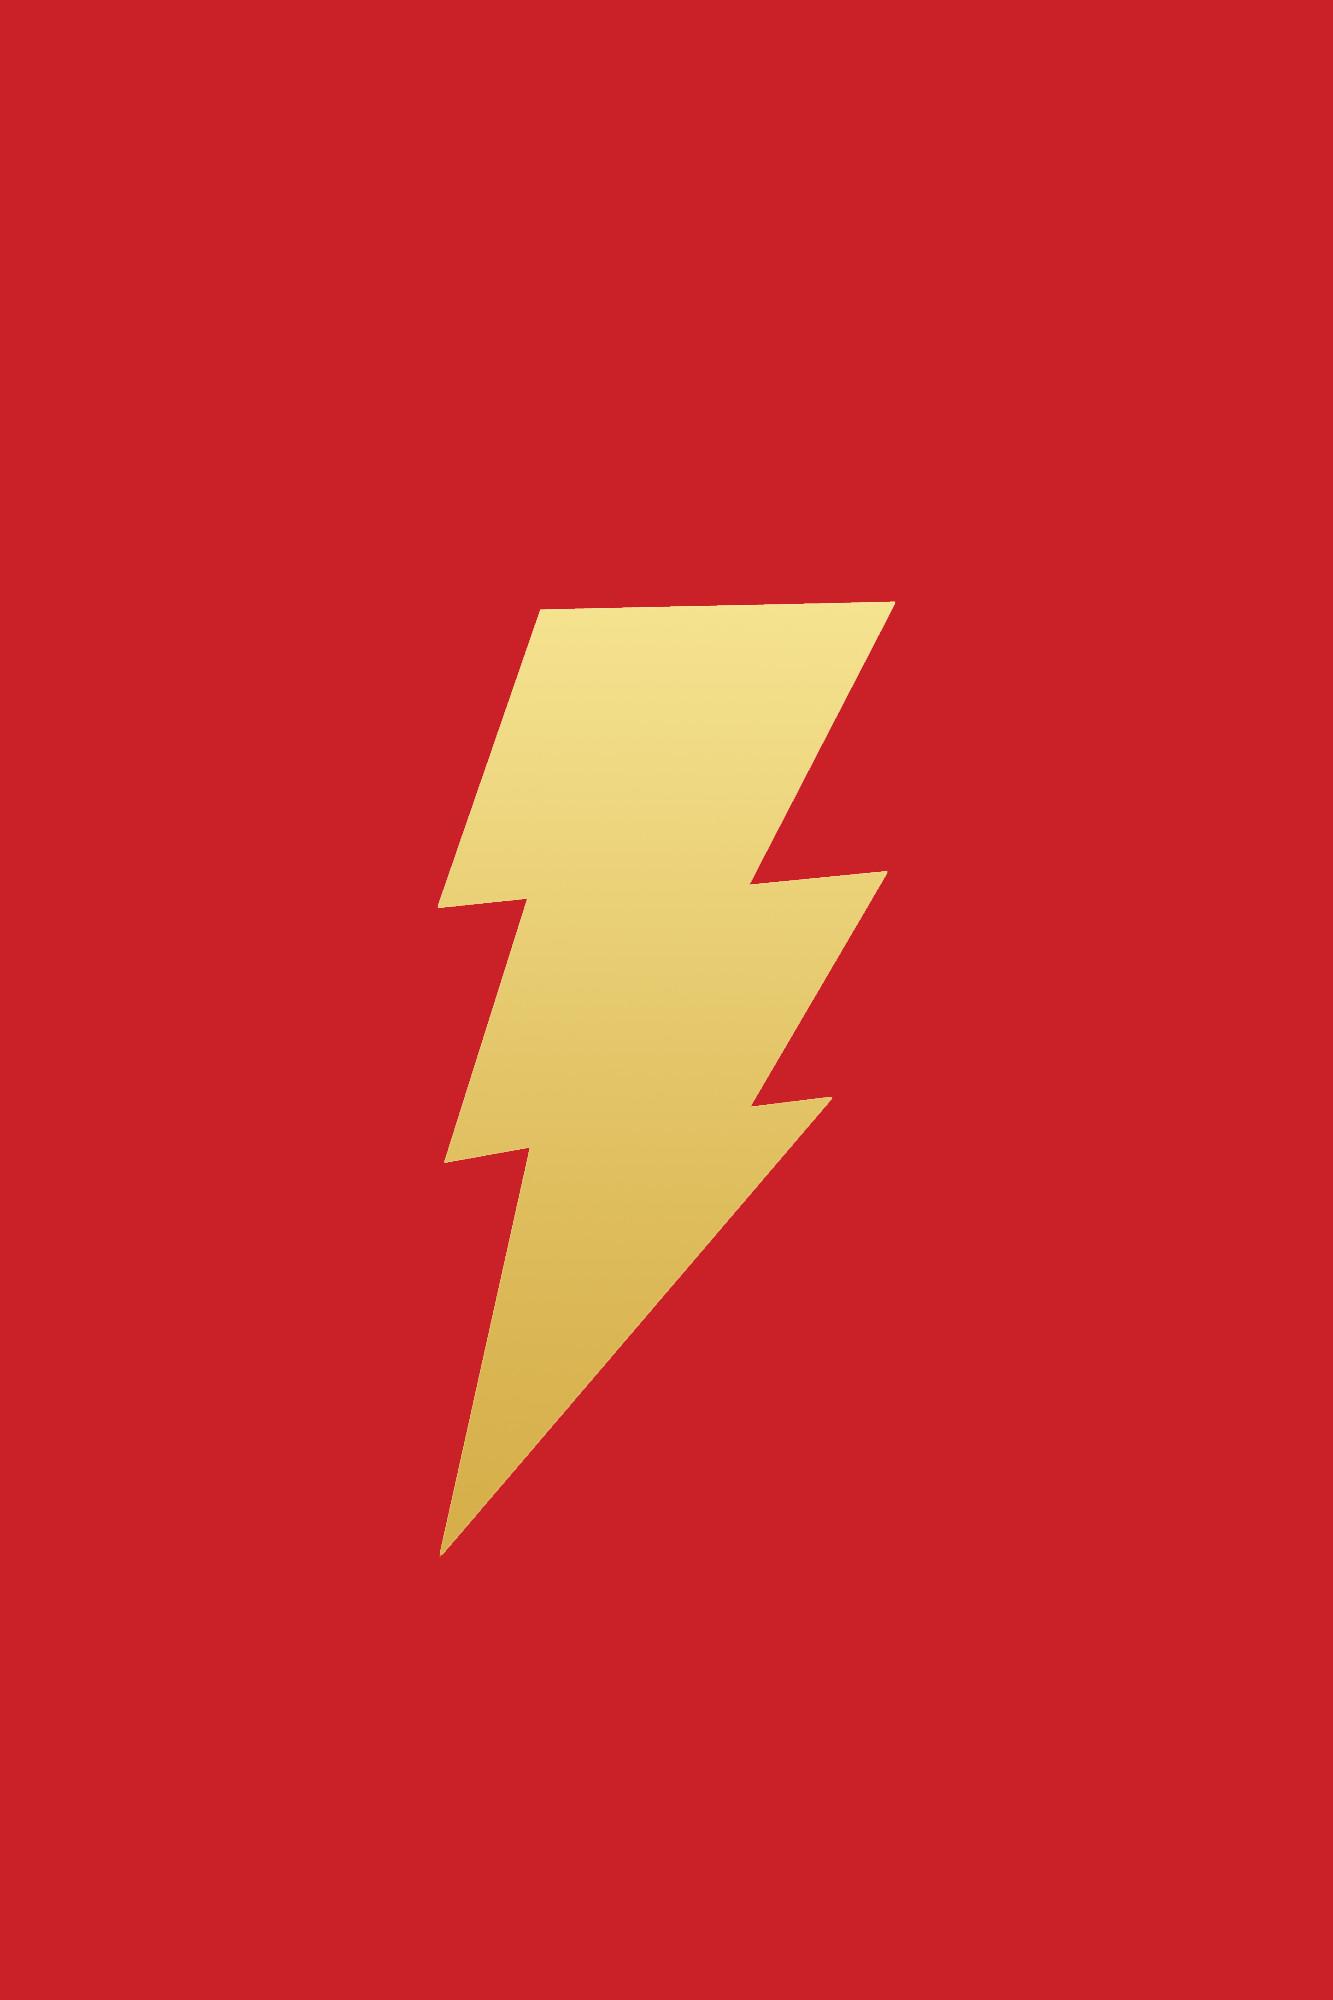 Flash logo iphone wallpaper